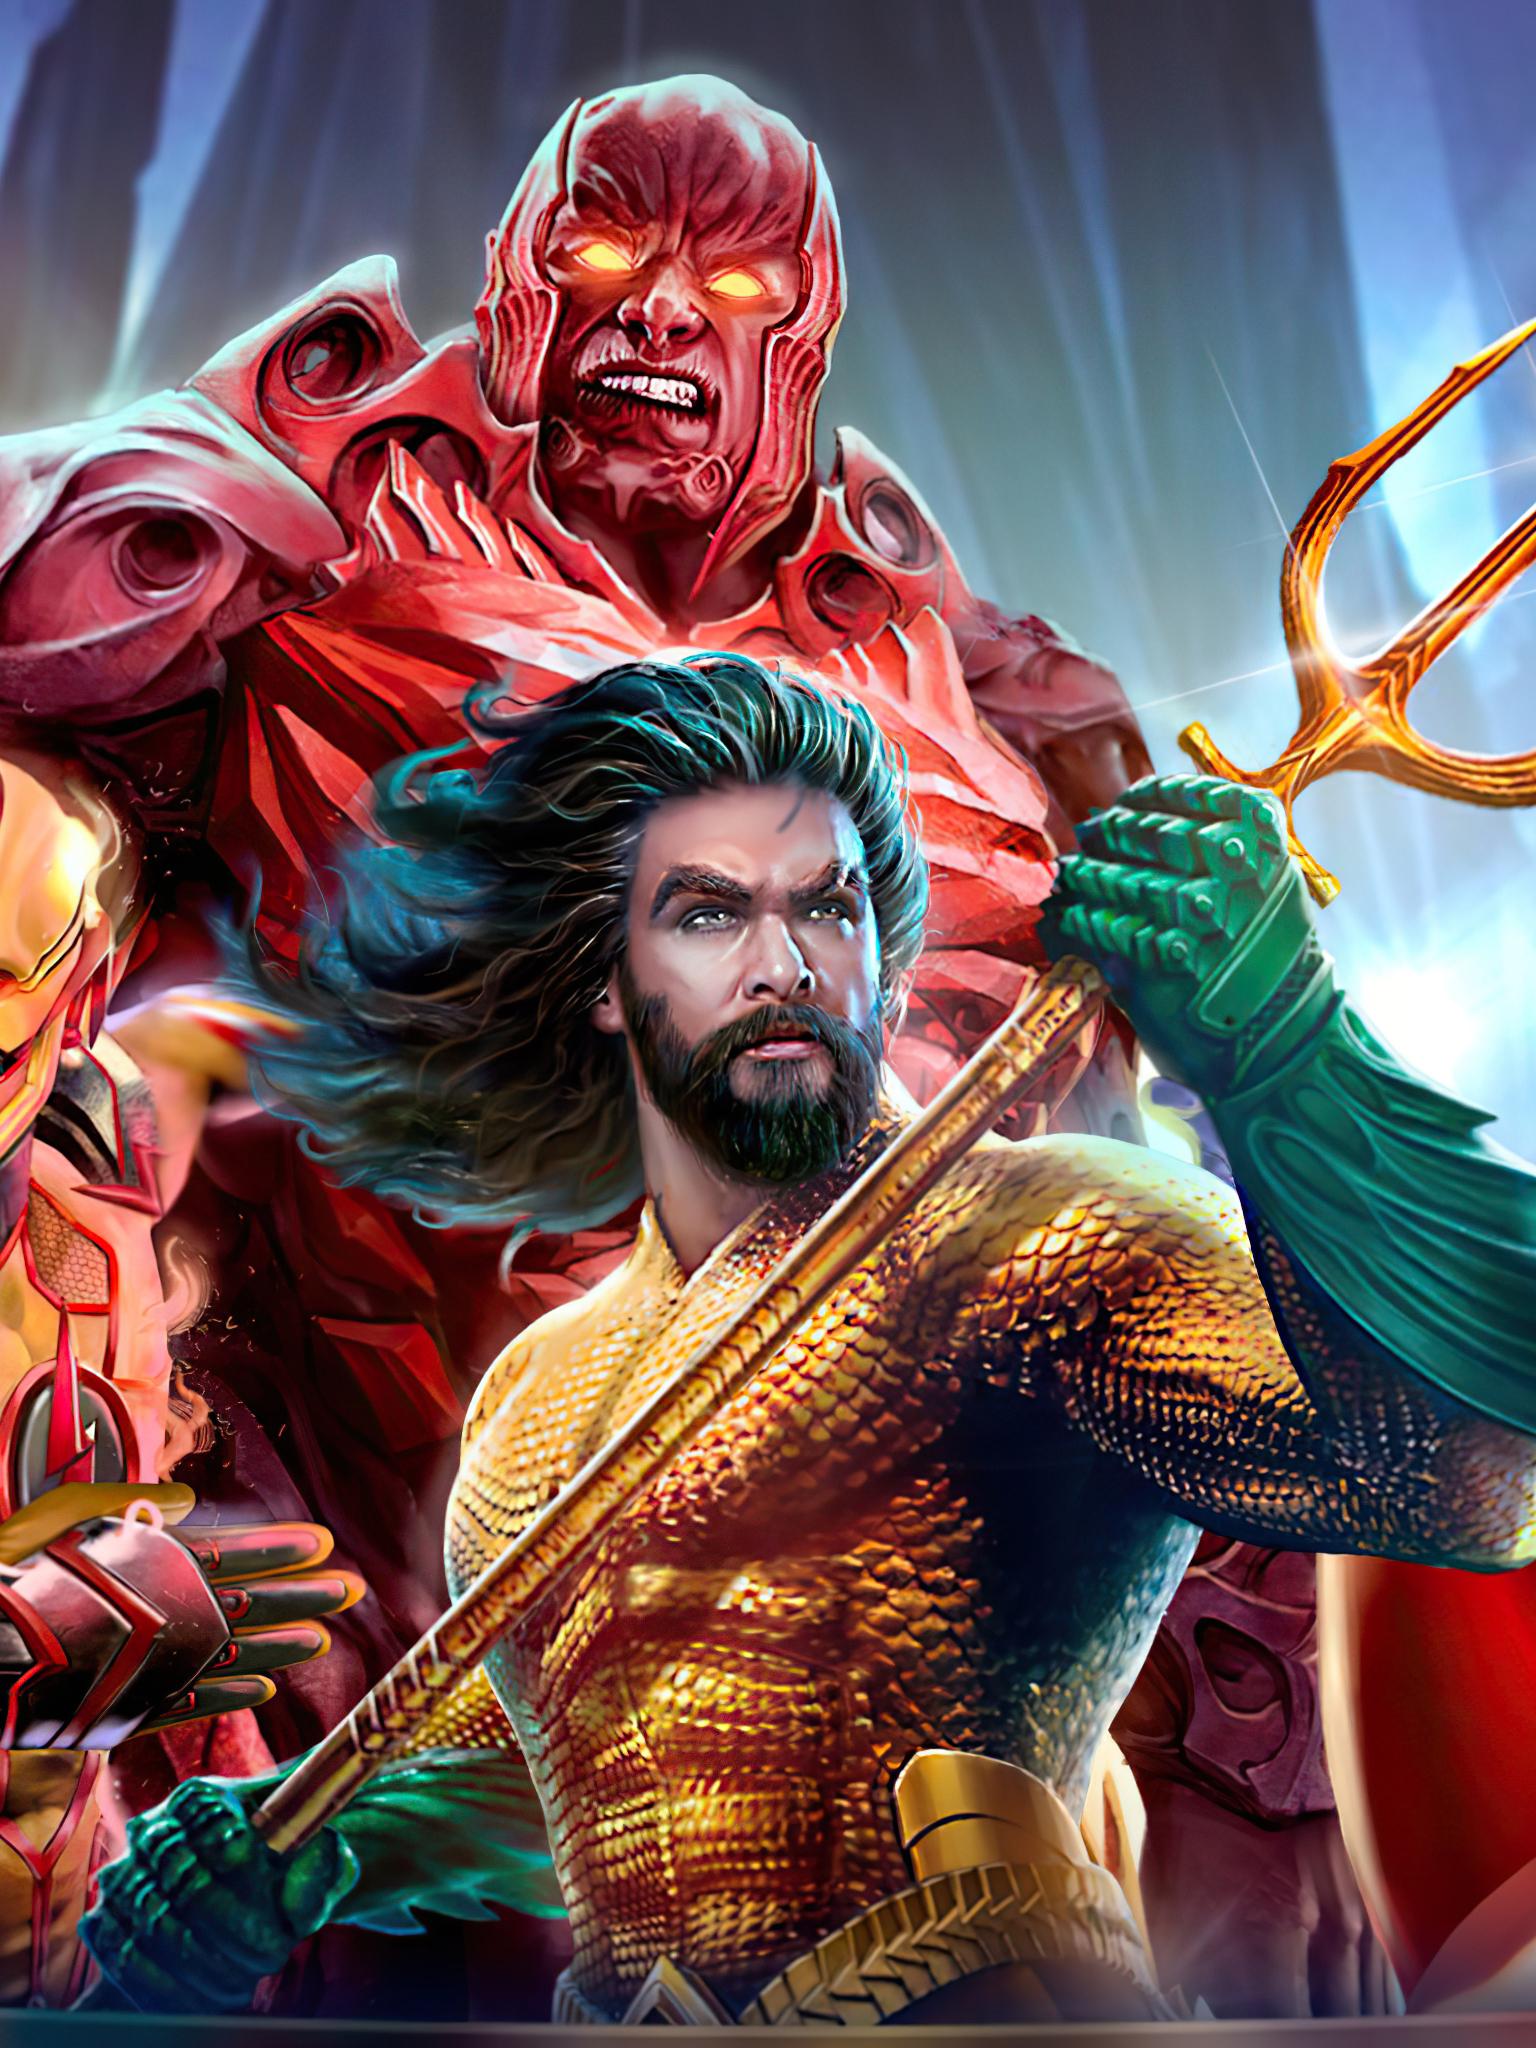 1536x2048 Injustice 2 x Justice League 1536x2048 ...